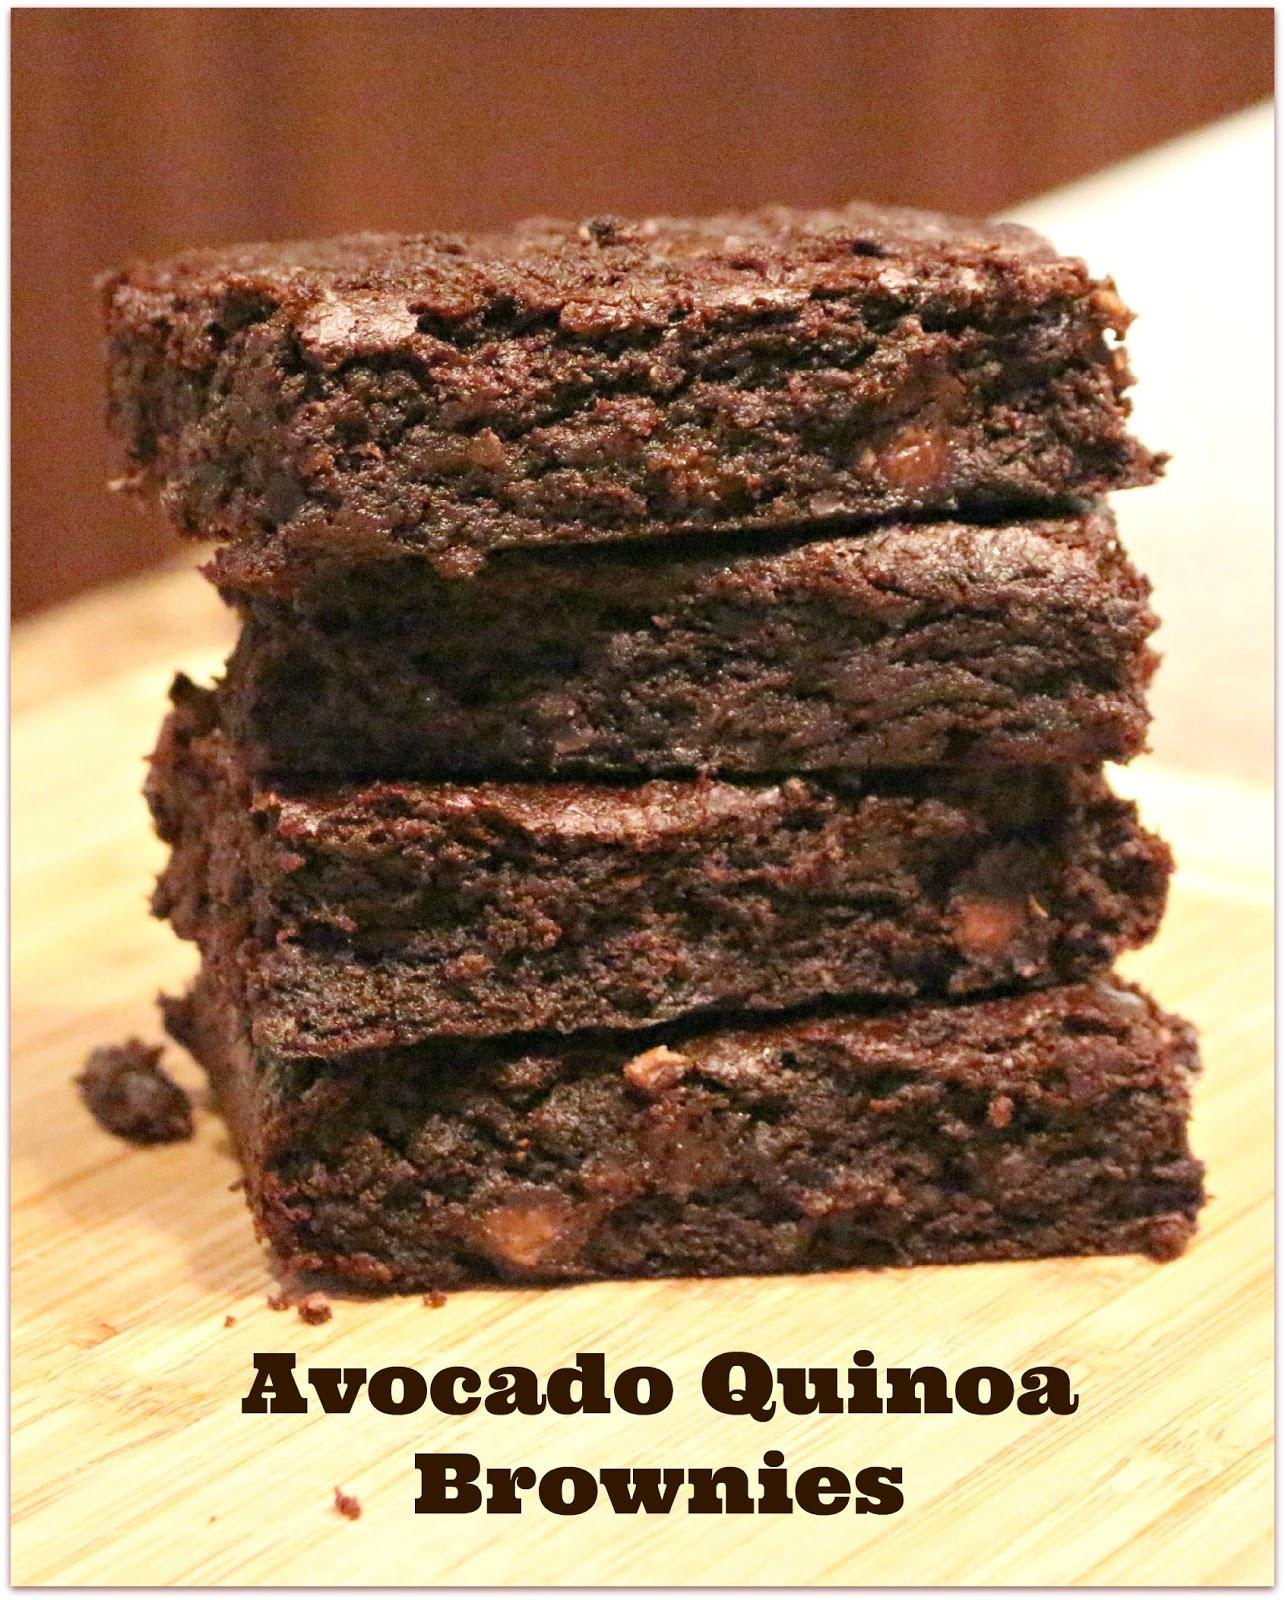 Jenn's Random Scraps: Avocado Quinoa Brownies